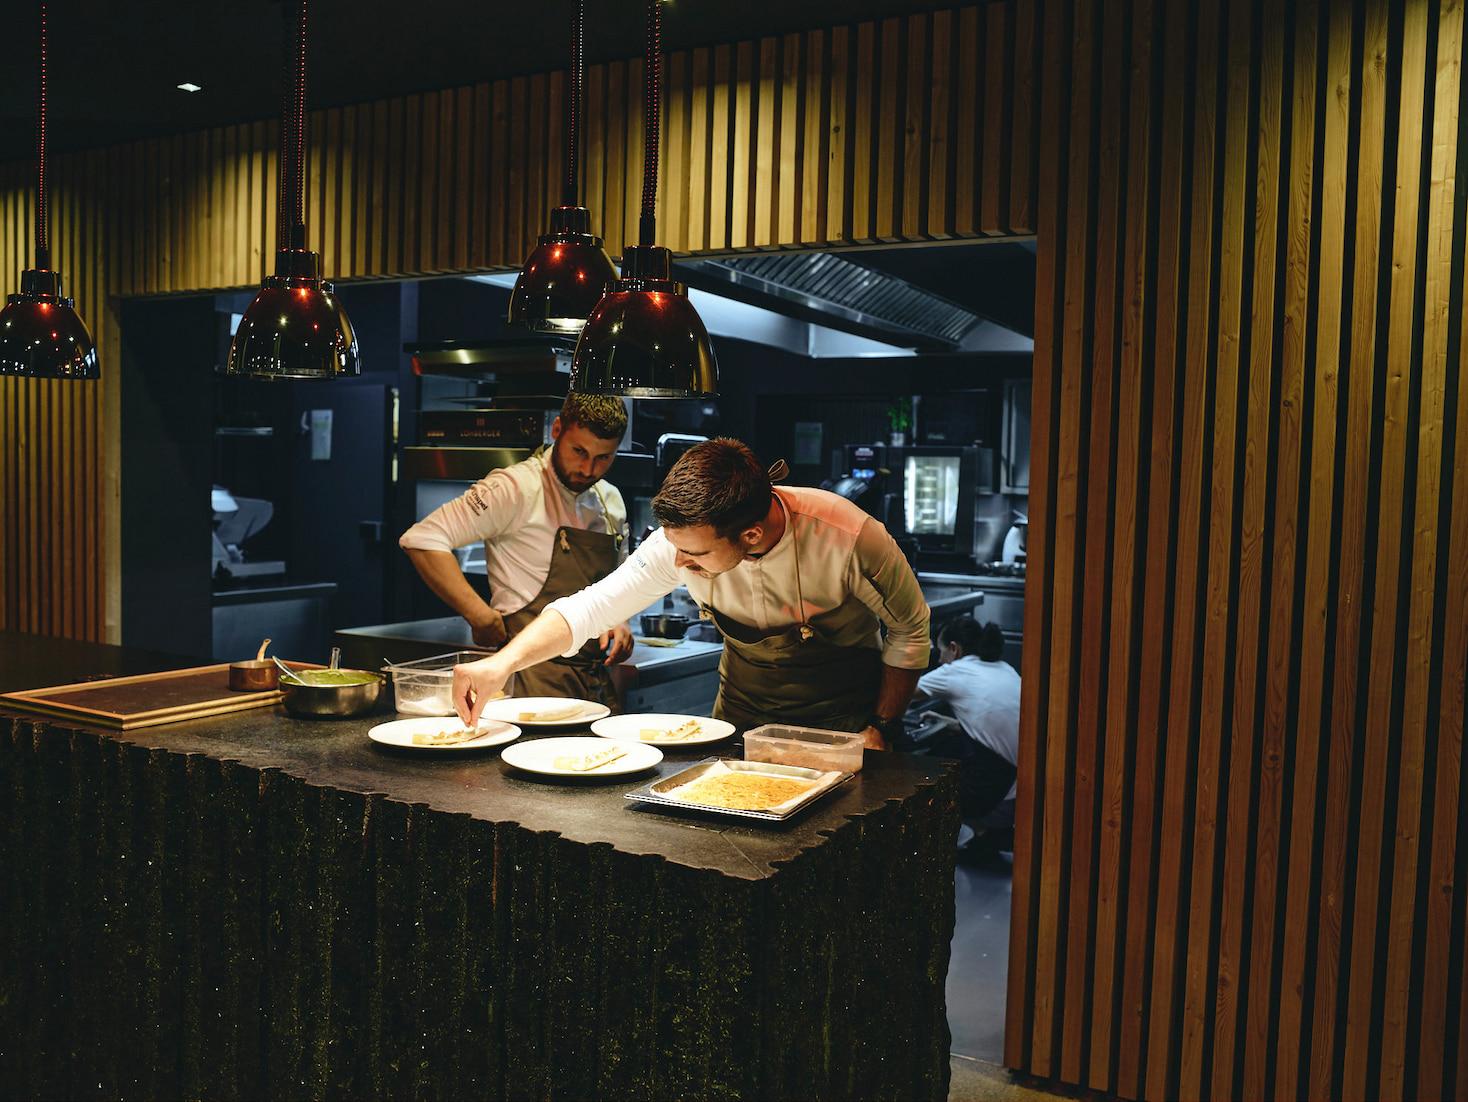 Genusstheatar Krispel